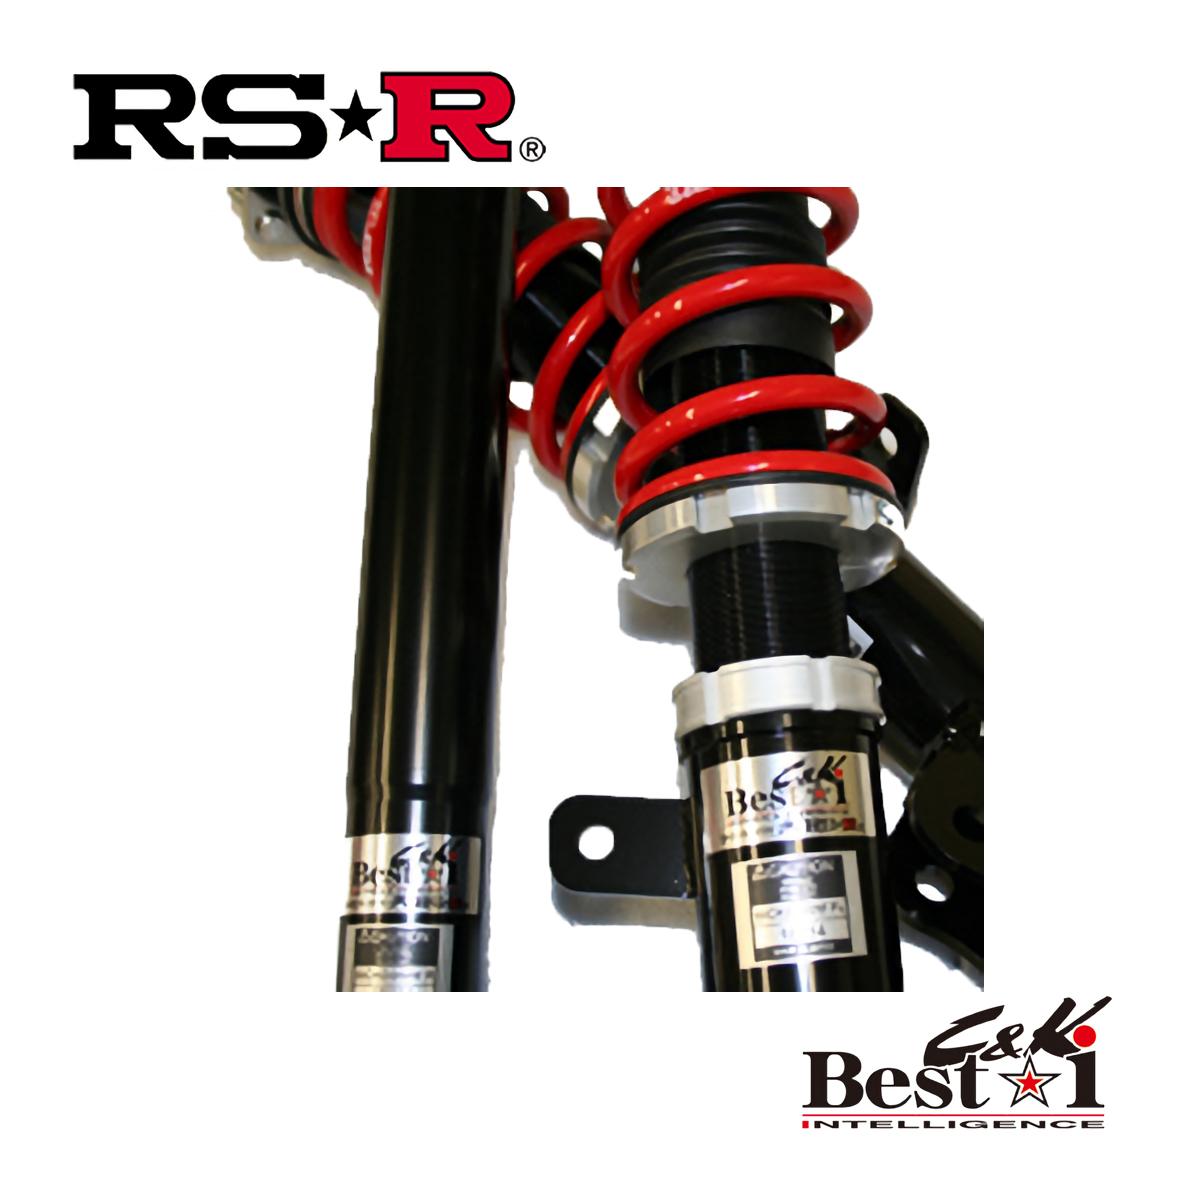 RS-R ジャスティ G スマートアシスト M900F 車高調 リア車高調整:ネジ式 BICKT512M ベストi C&K RSR 条件付き送料無料